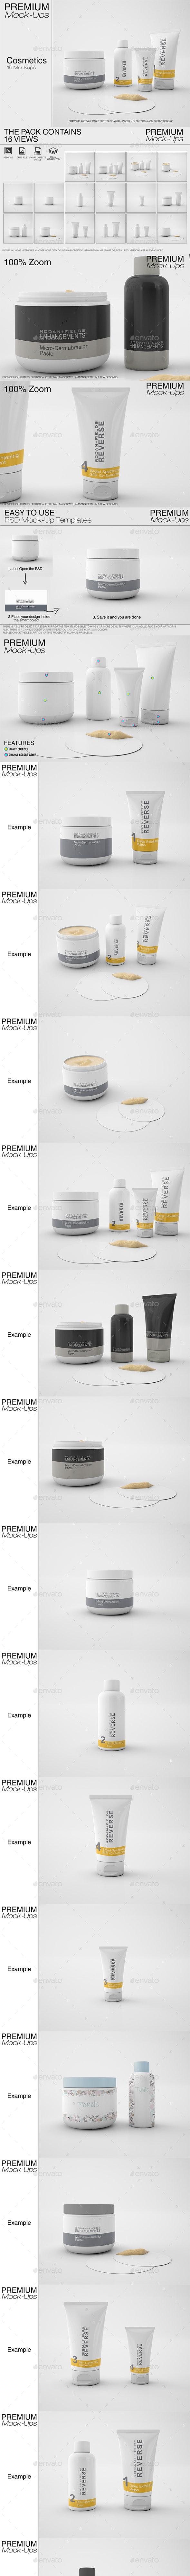 Cosmetics Mockup Pack - Print Product Mock-Ups